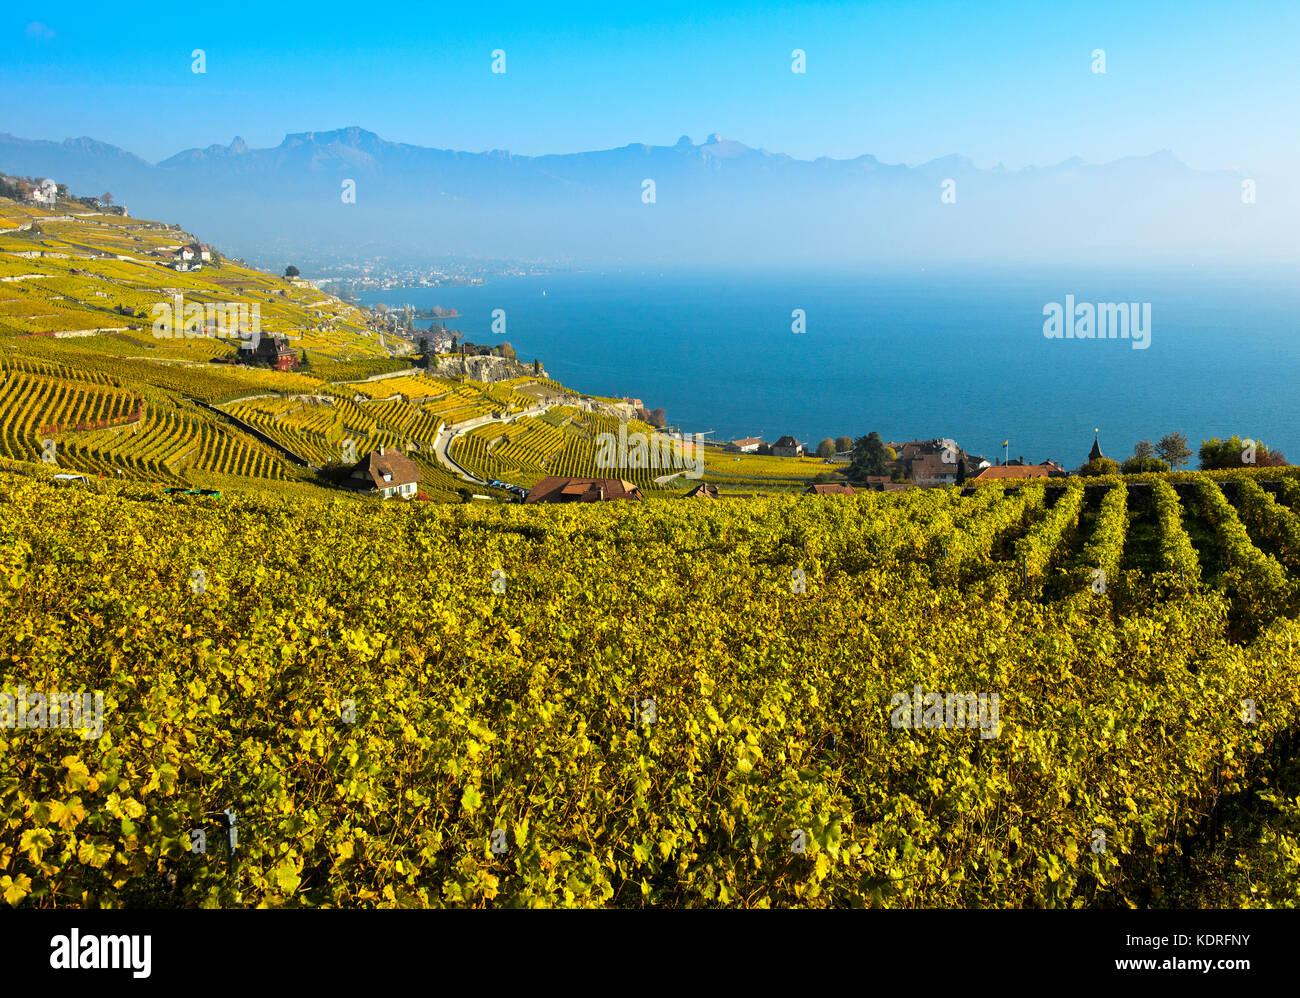 Vineyards in golden autumn foliage rising above Lake Geneva, Rivaz, Lavaux, Vaud, Switzerland - Stock Image